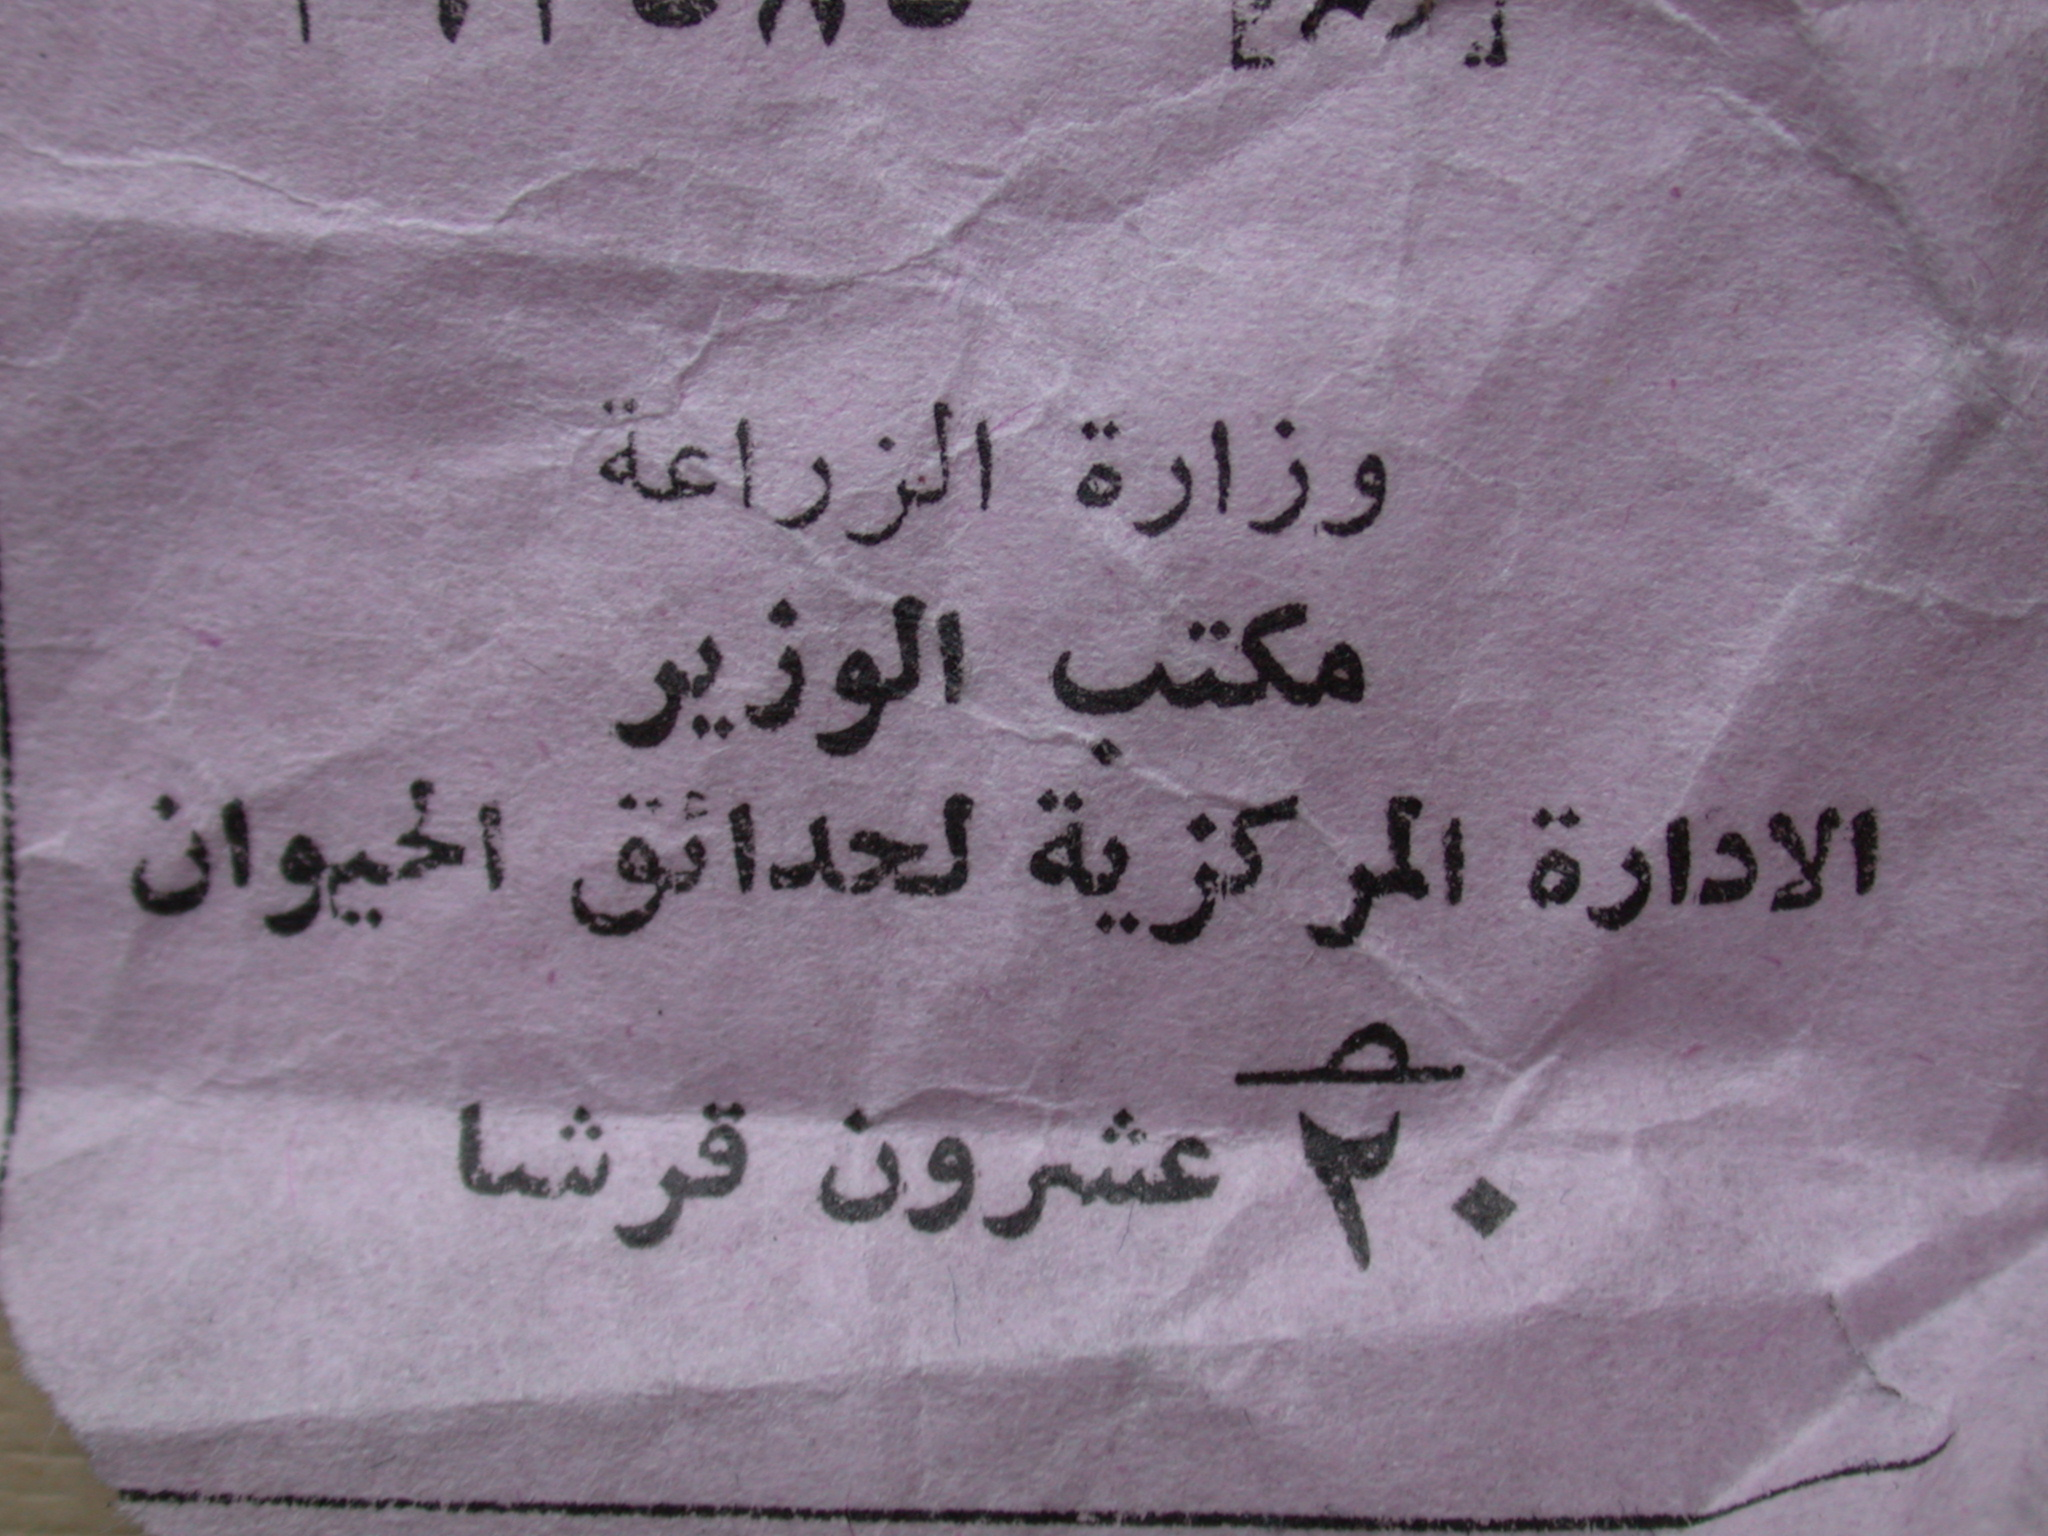 writing arabian arab middle-eastern black ink paper